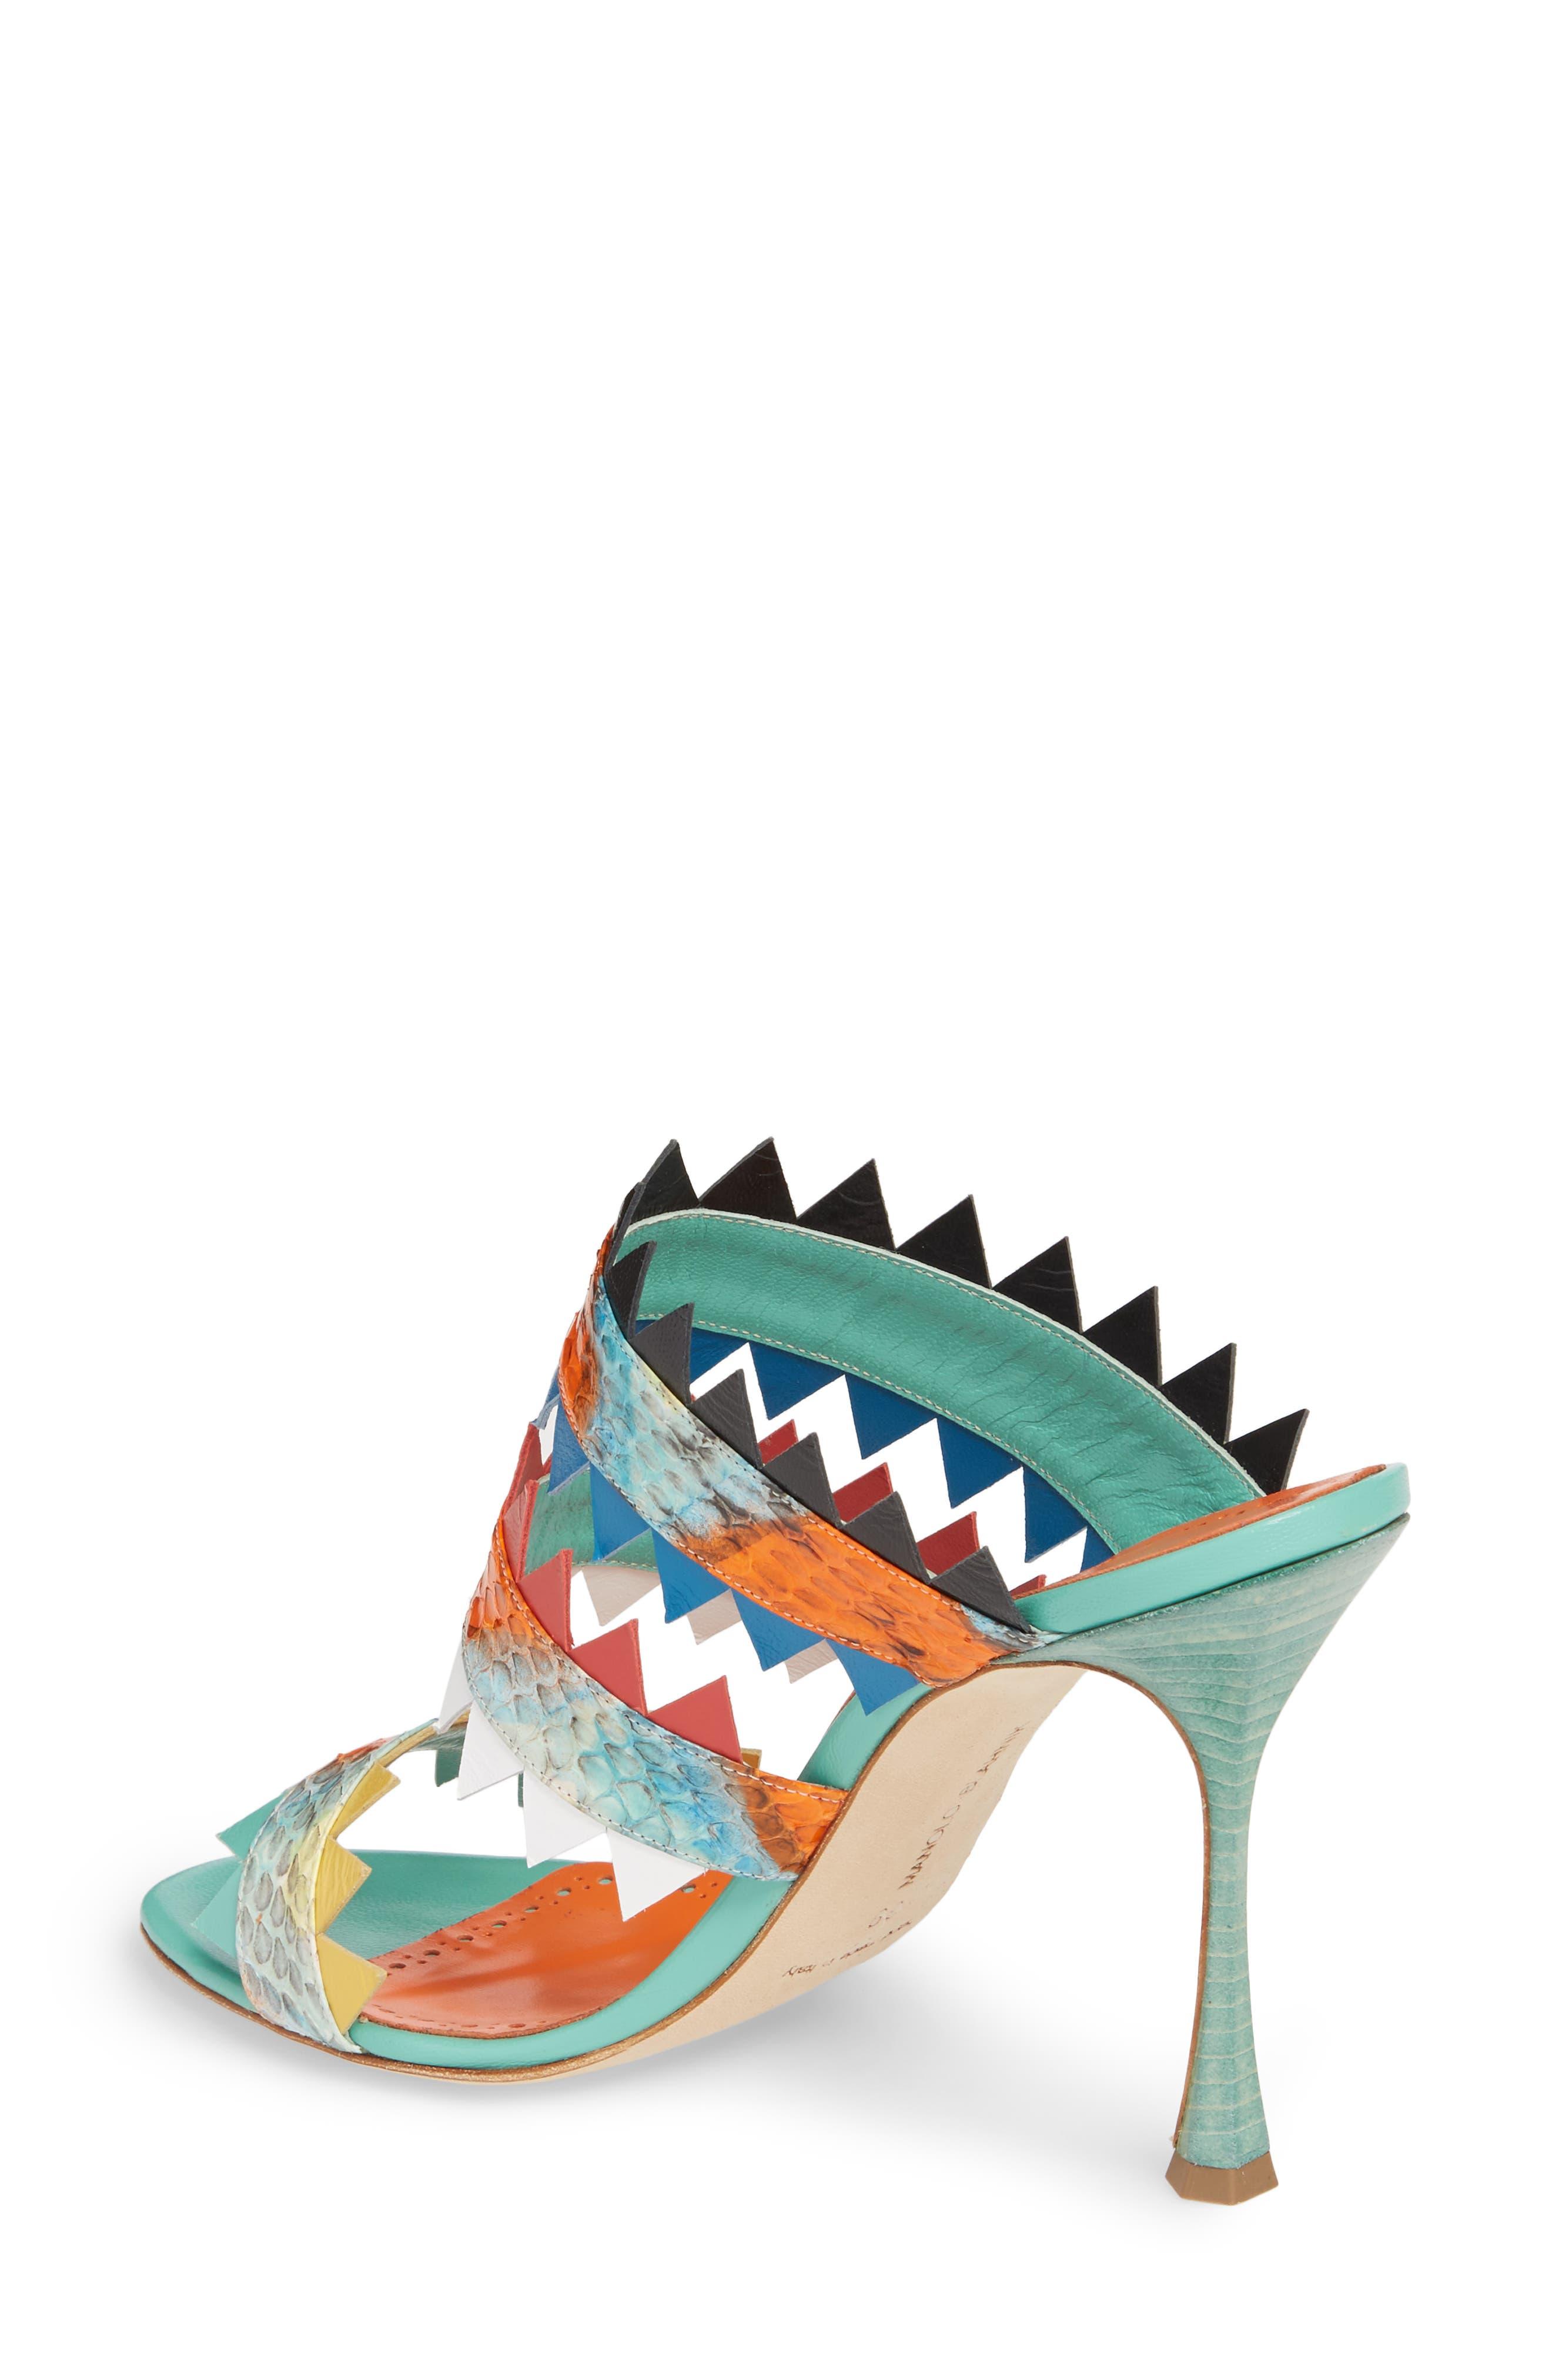 Arpege Mule Sandal,                             Alternate thumbnail 2, color,                             Watersnake Multi